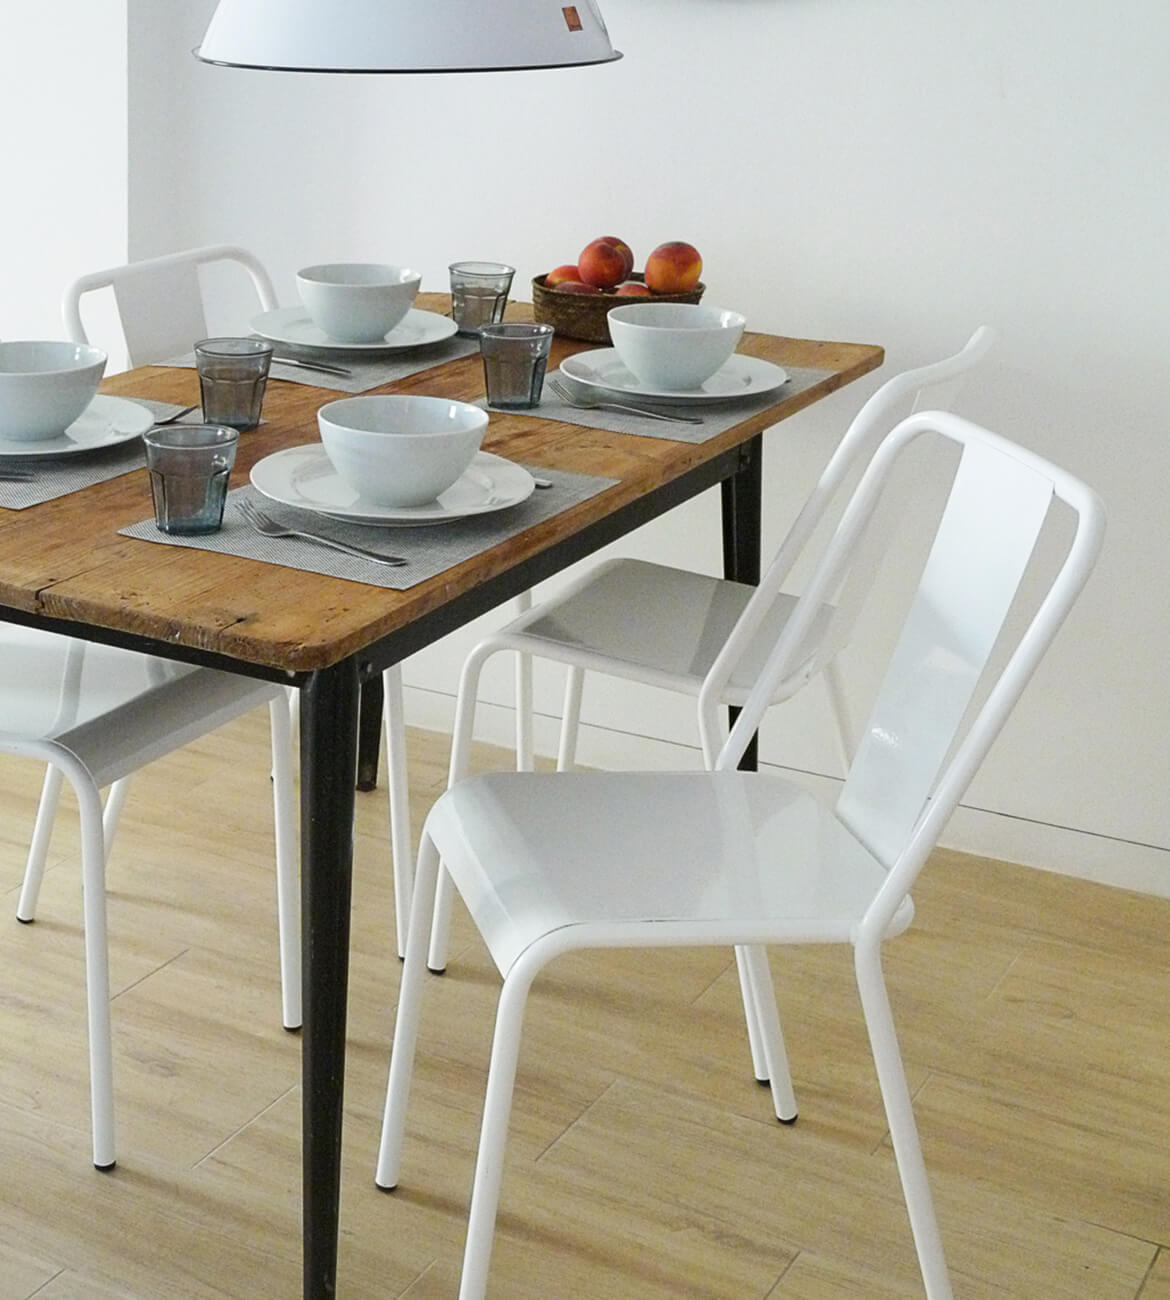 detalle sillas metal blancas proyecto de interiorísmo Catalina House para apartamento puerto Fuensanta